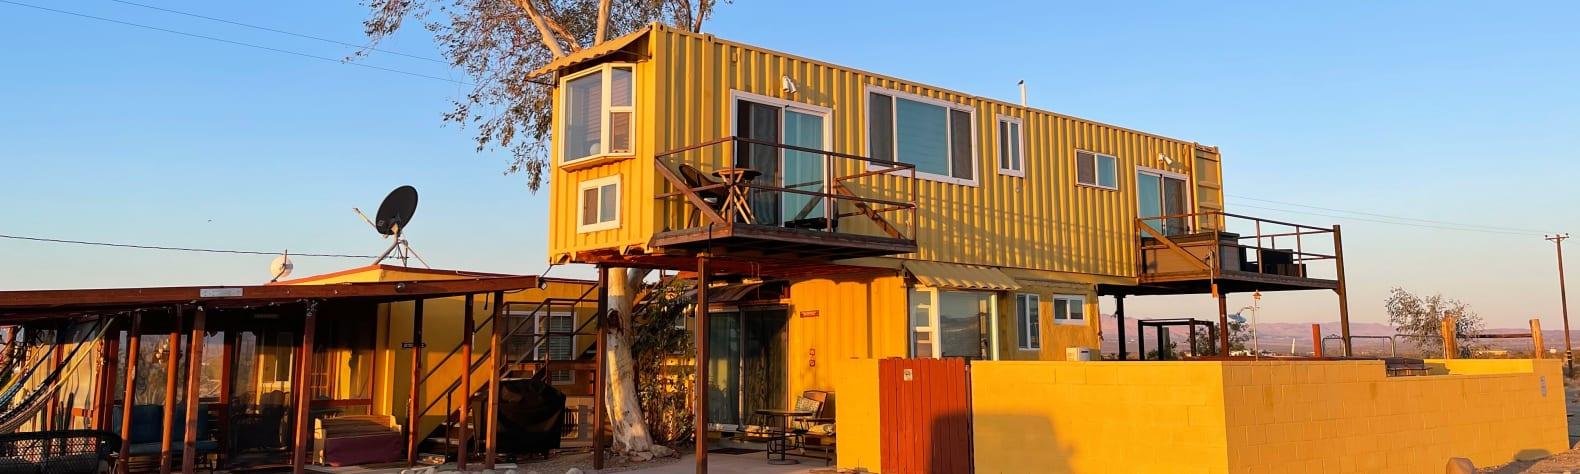 Joshua Tree Container Resort